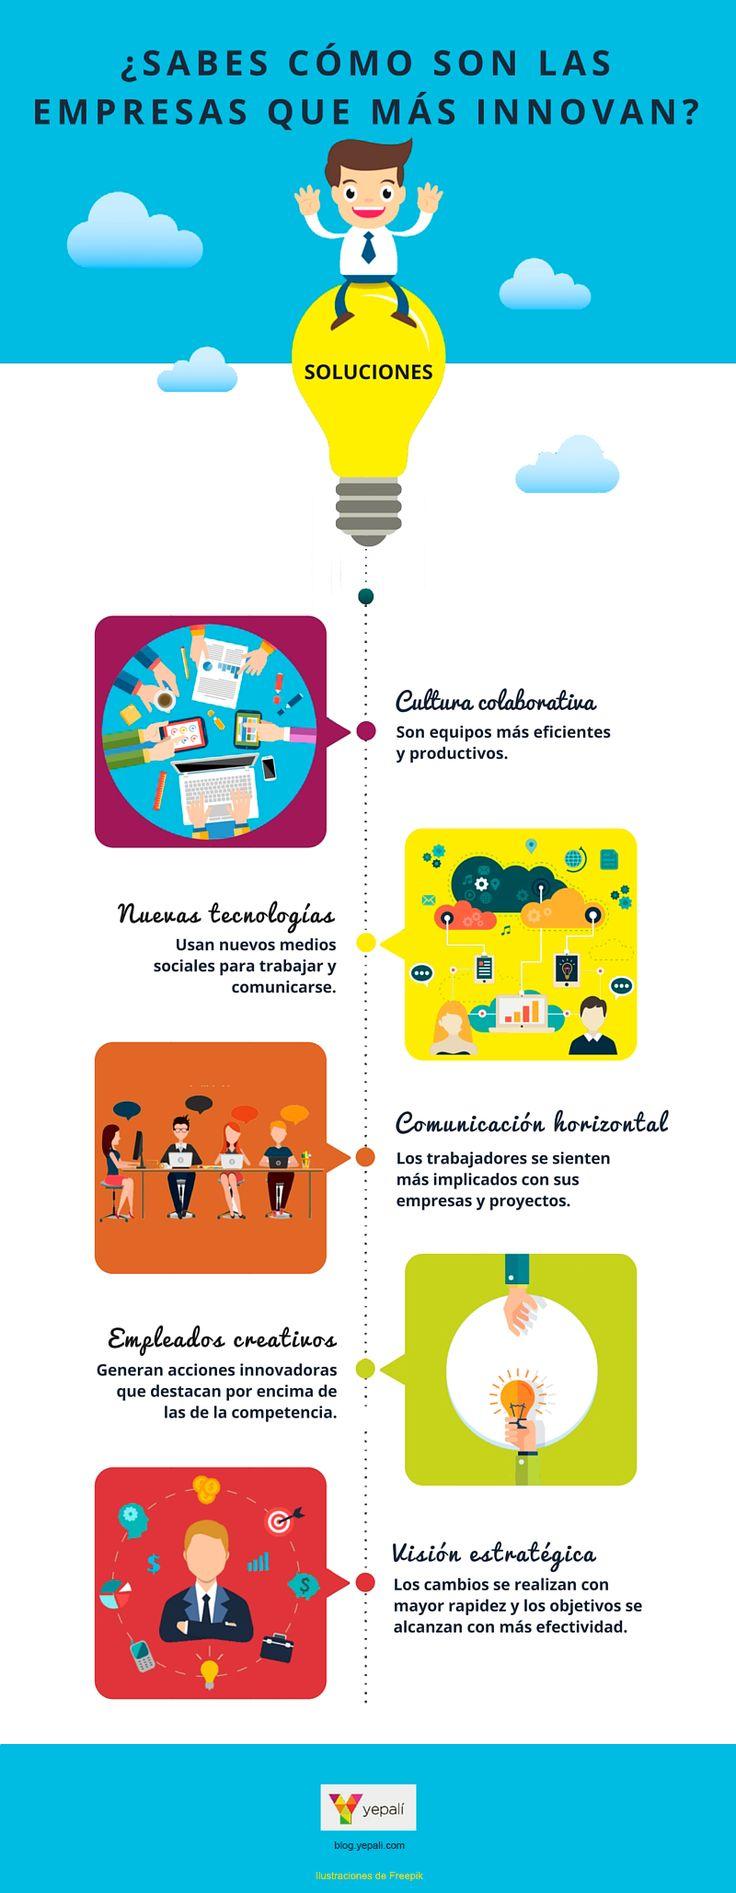 Cómo son las empresas innovadoras #infografia #infographic #innovation